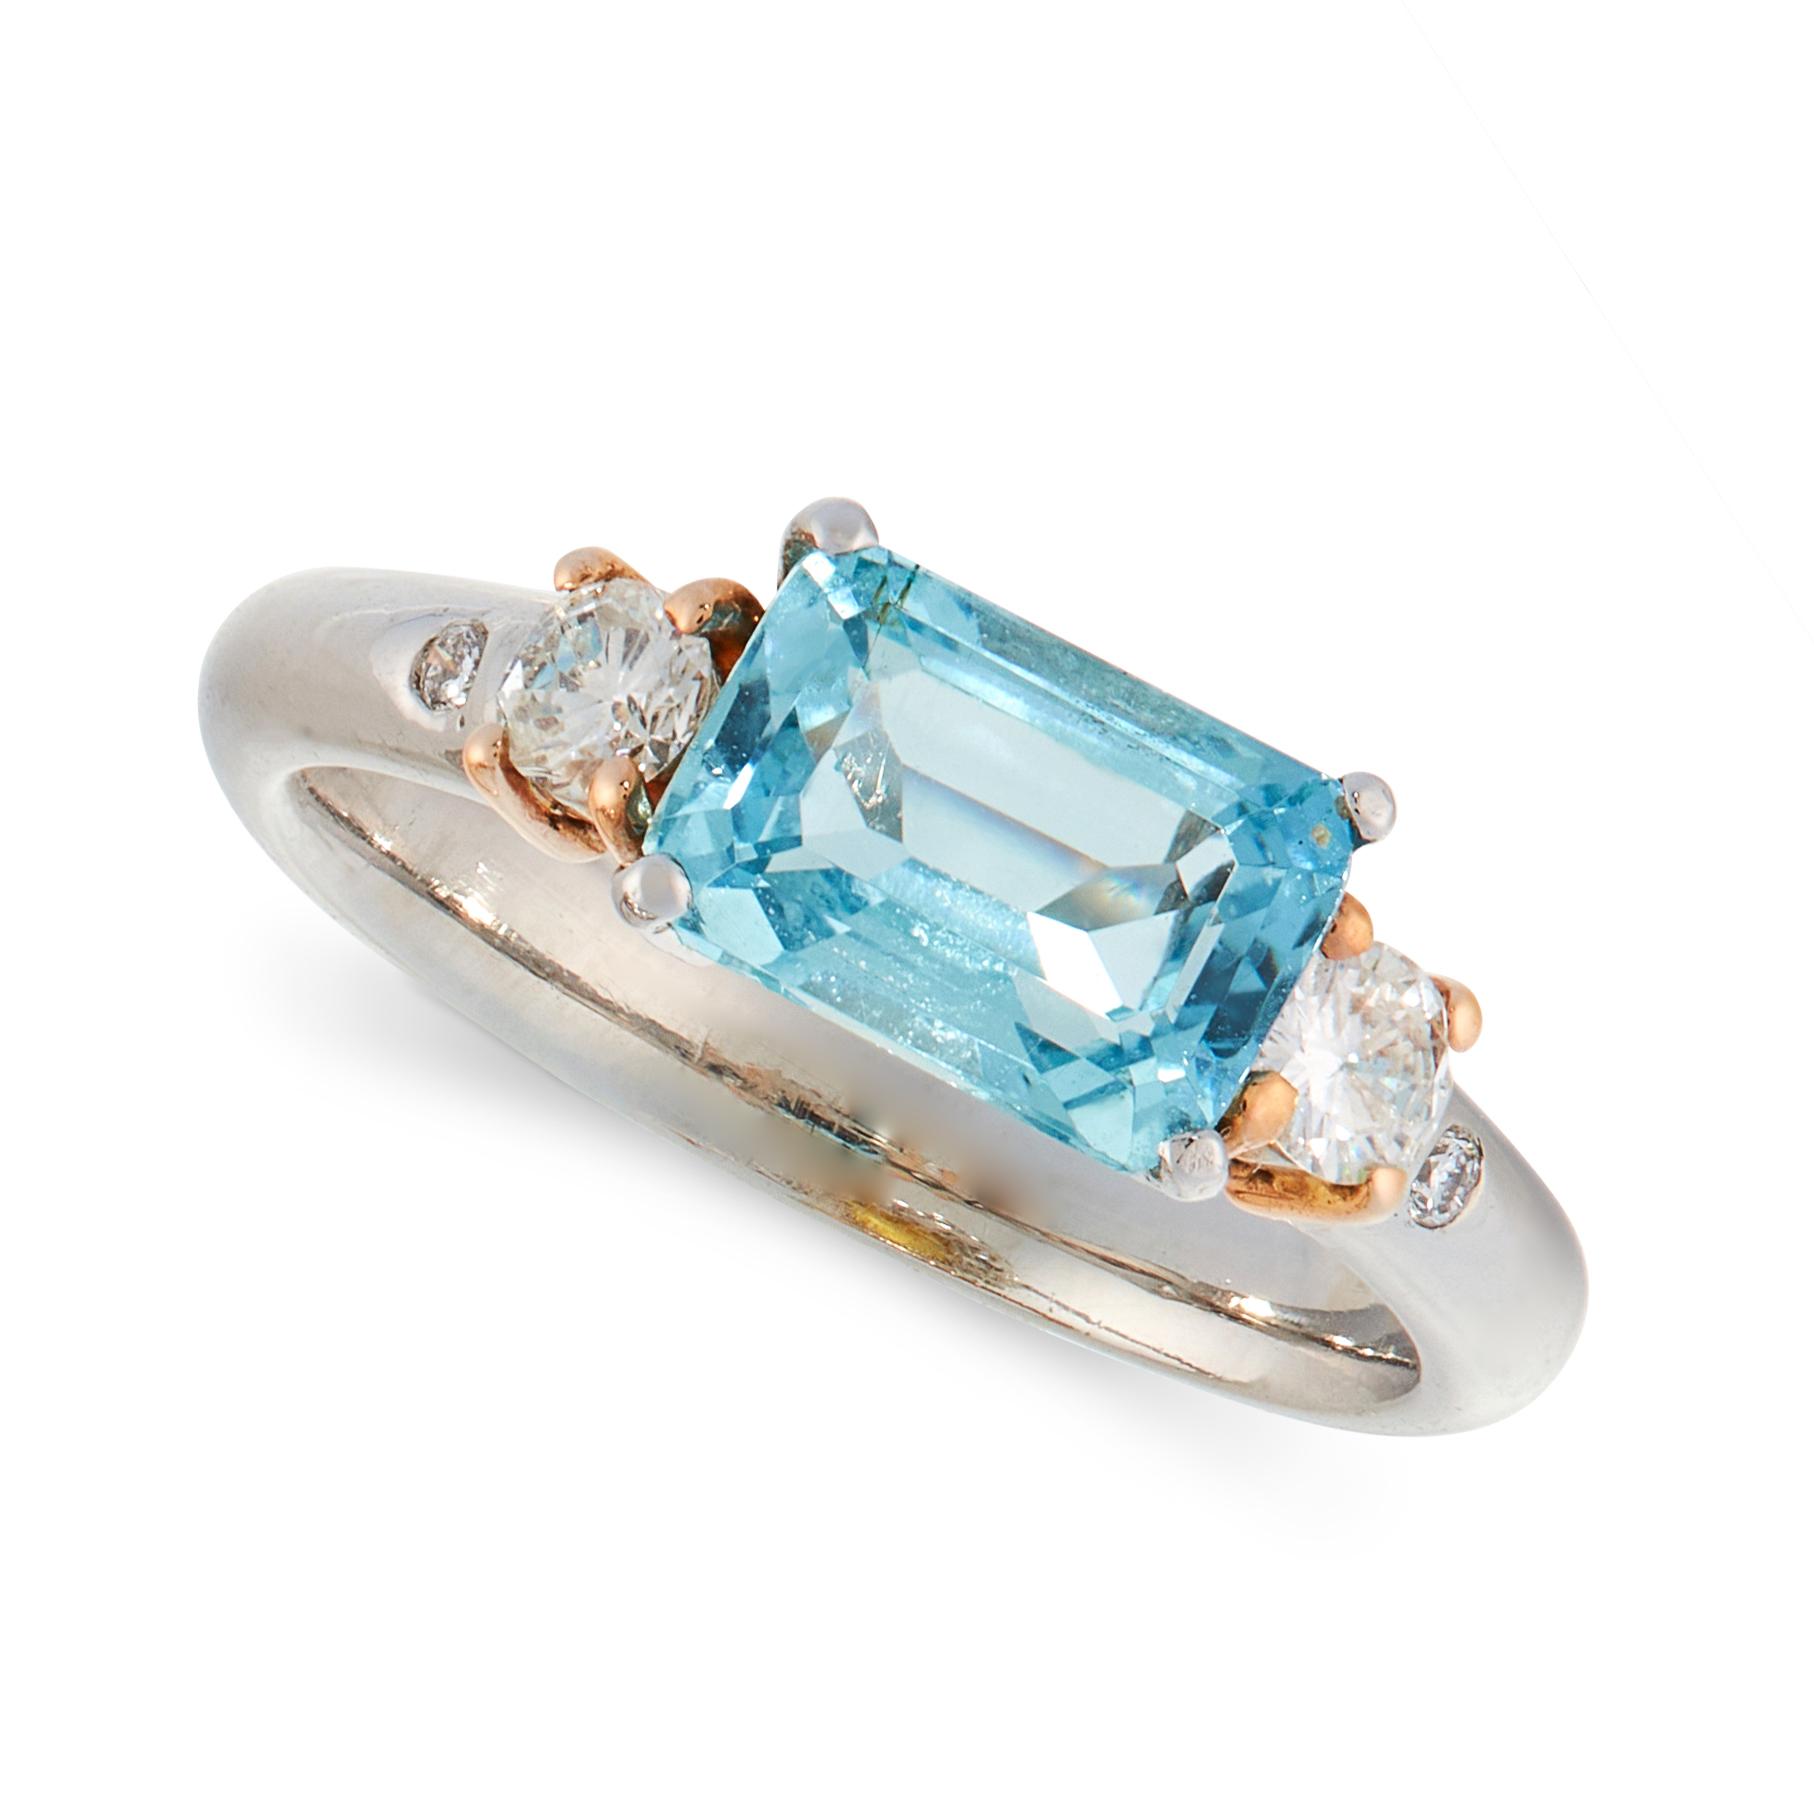 AQUAMARINE AND DIAMOND DRESS RING, HIRSH in platinum, set with an emerald cut aquamarine of 1.72